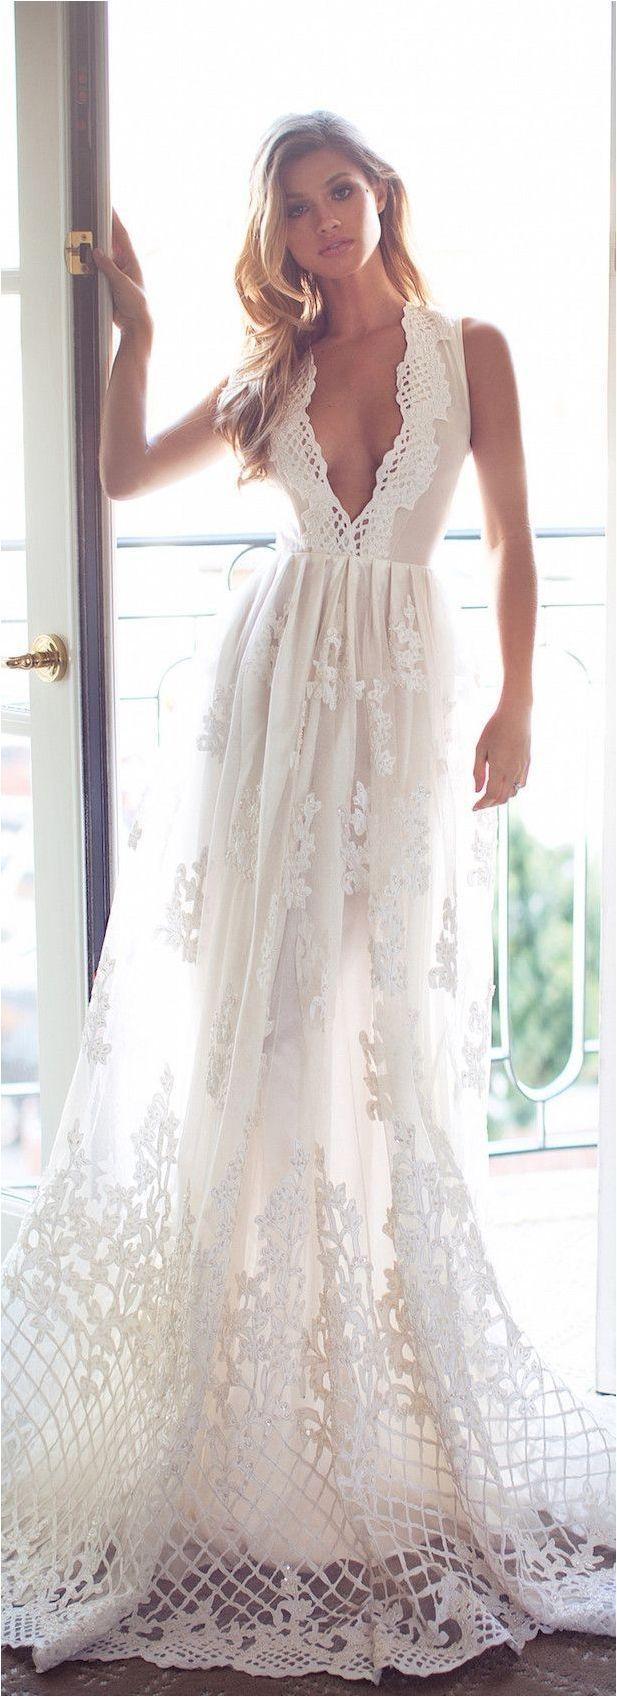 Wedding - 85 Comfortable Beach Wedding Dresses Inspiration 2017